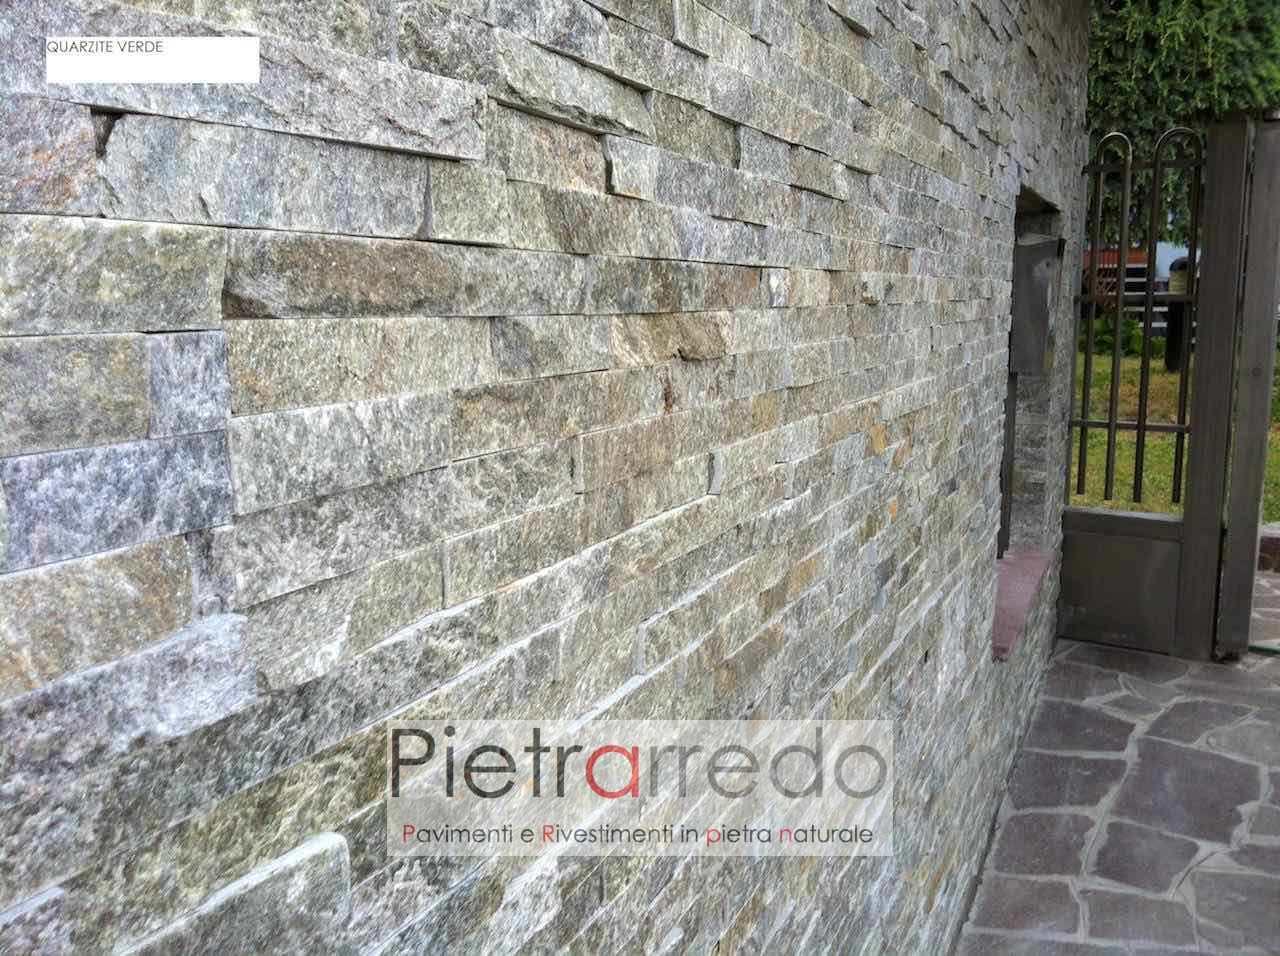 Pietra Verde Rivestimento : Rivestimento pietra quarzite verde 50% in offerta u20ac 53 mq